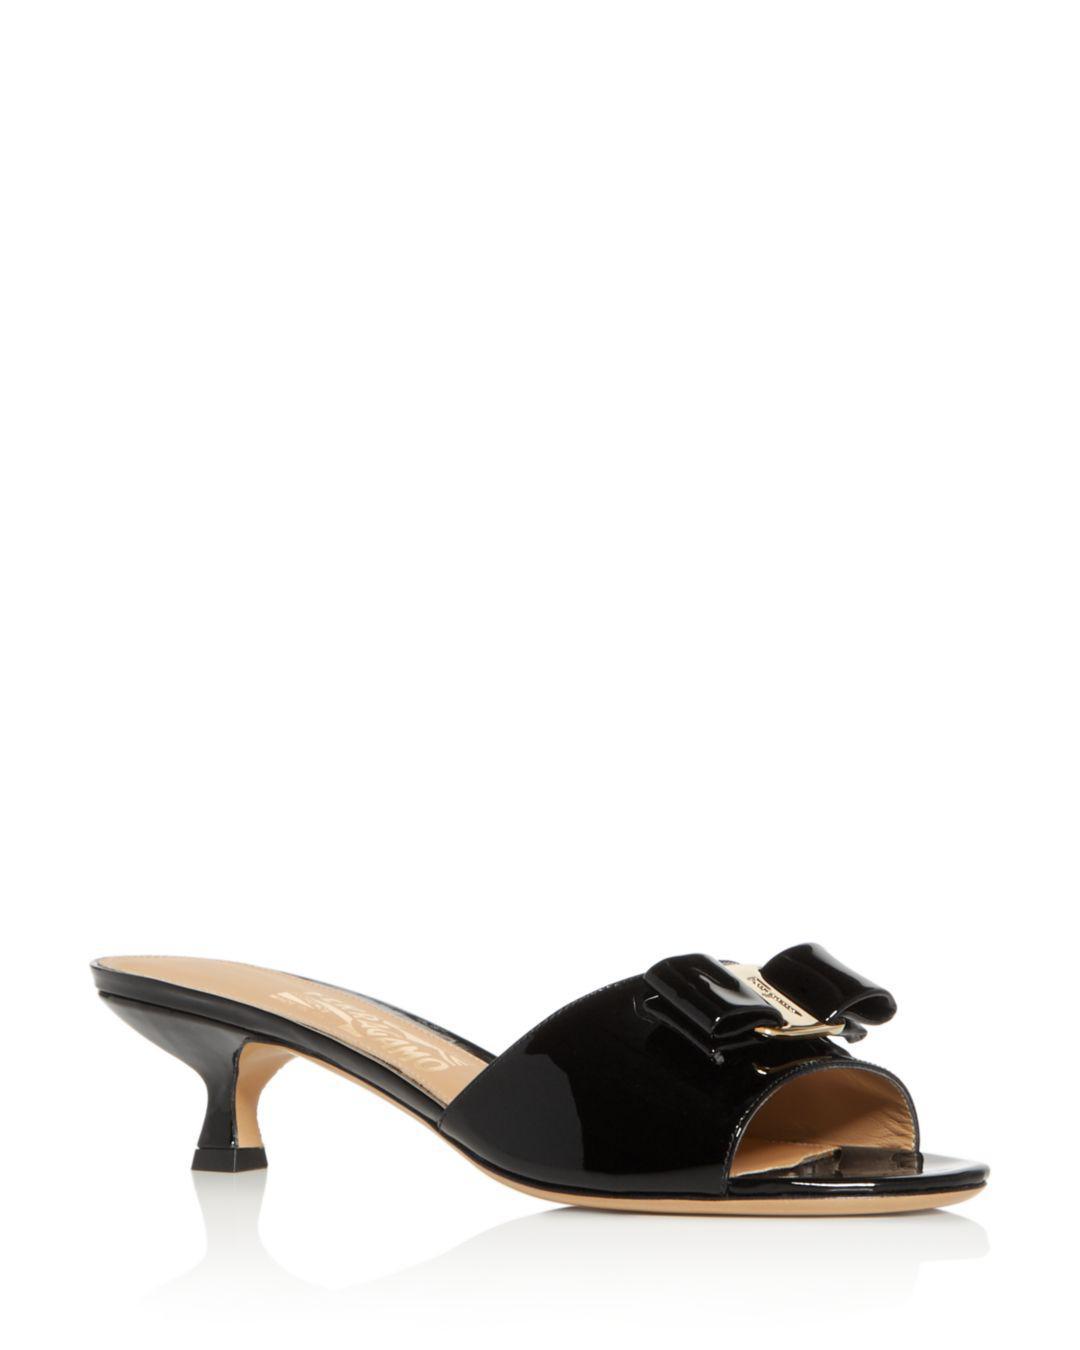 eb47cf6d74d0 Lyst - Ferragamo Women s Gino Kitten-heel Slide Sandals in Black